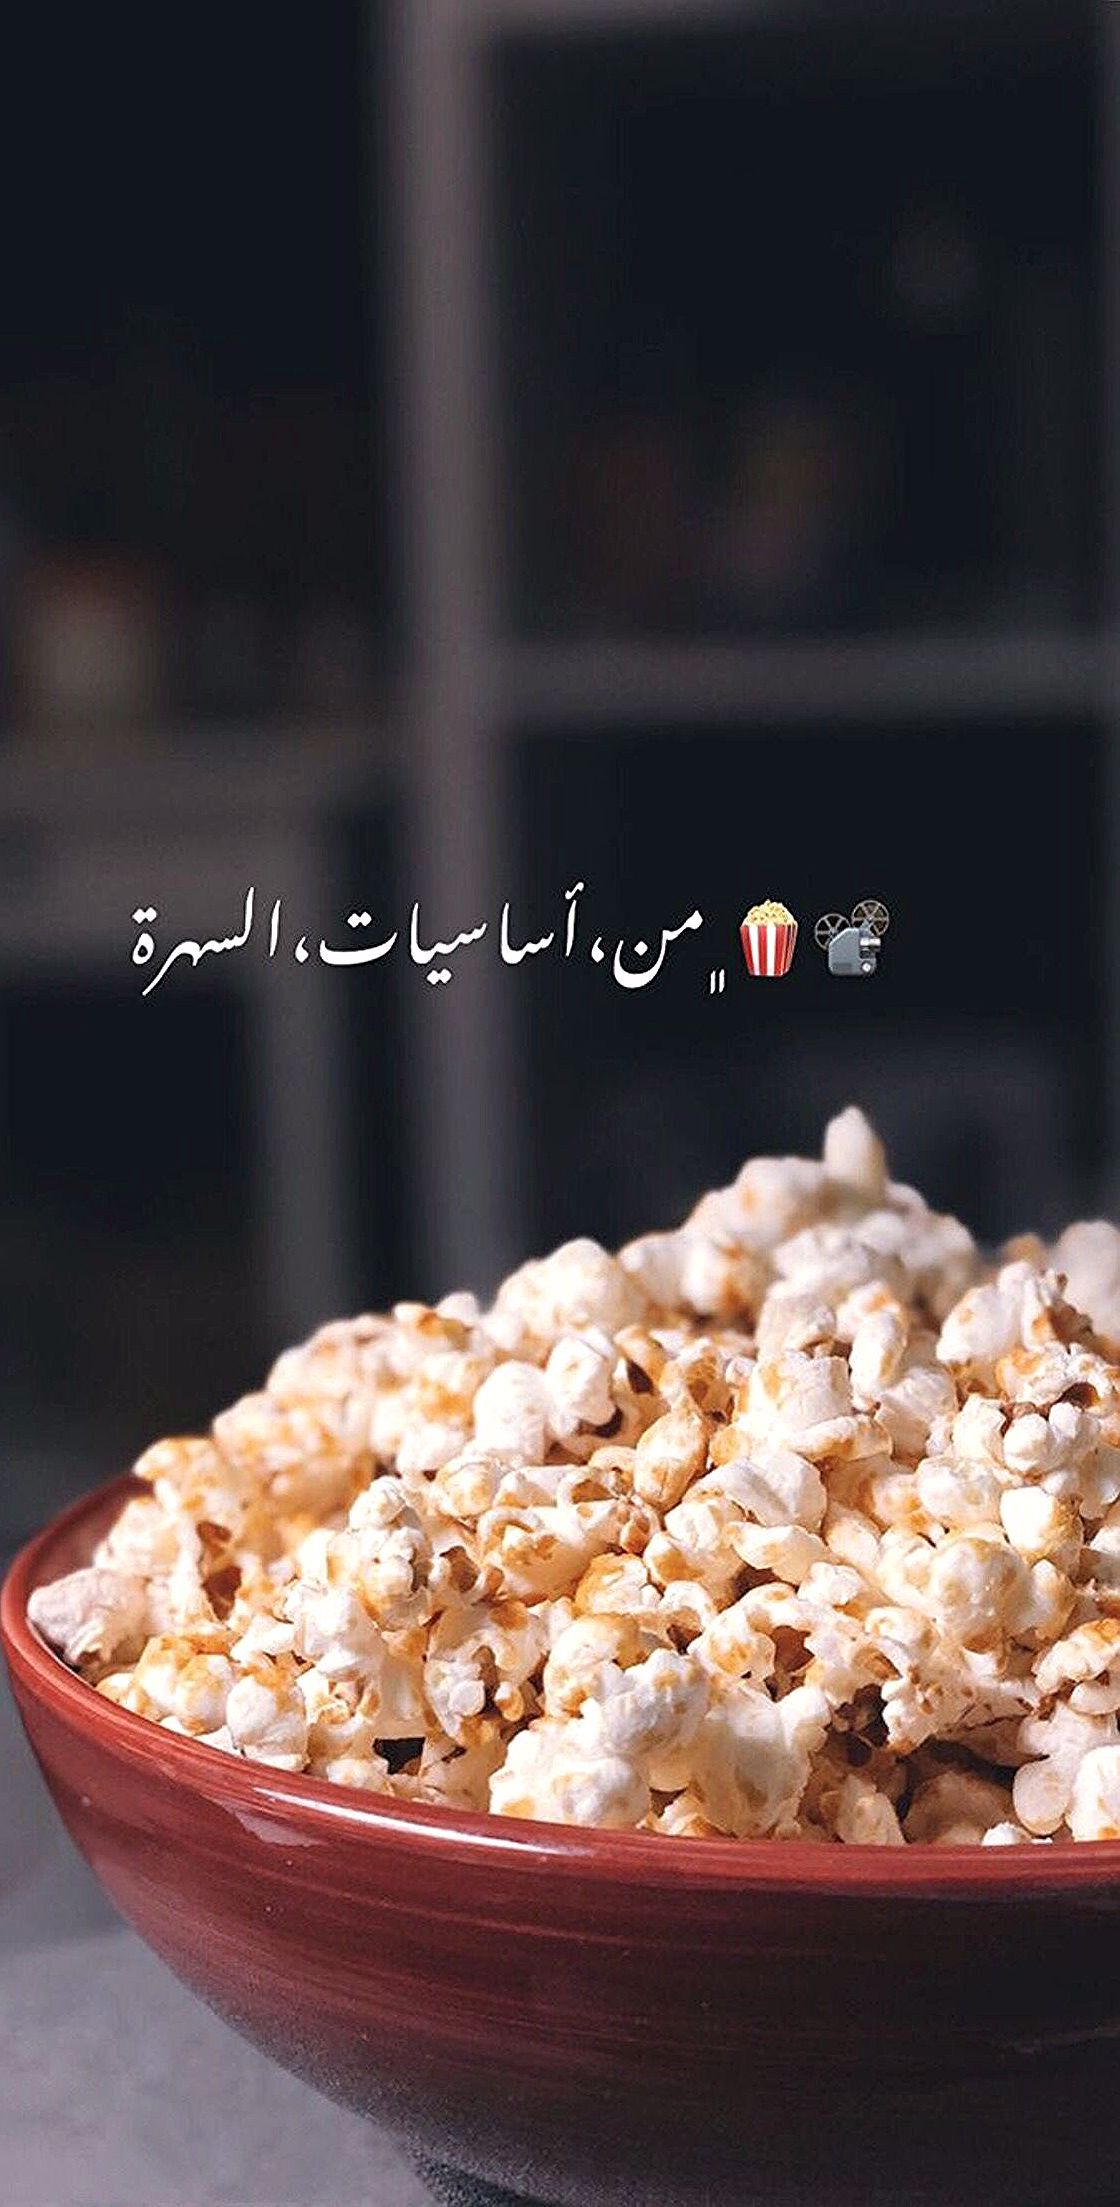 Pin By Aya Iu On وردة حمراء Arabic Quotes Food Snapchat Funny Arabic Quotes